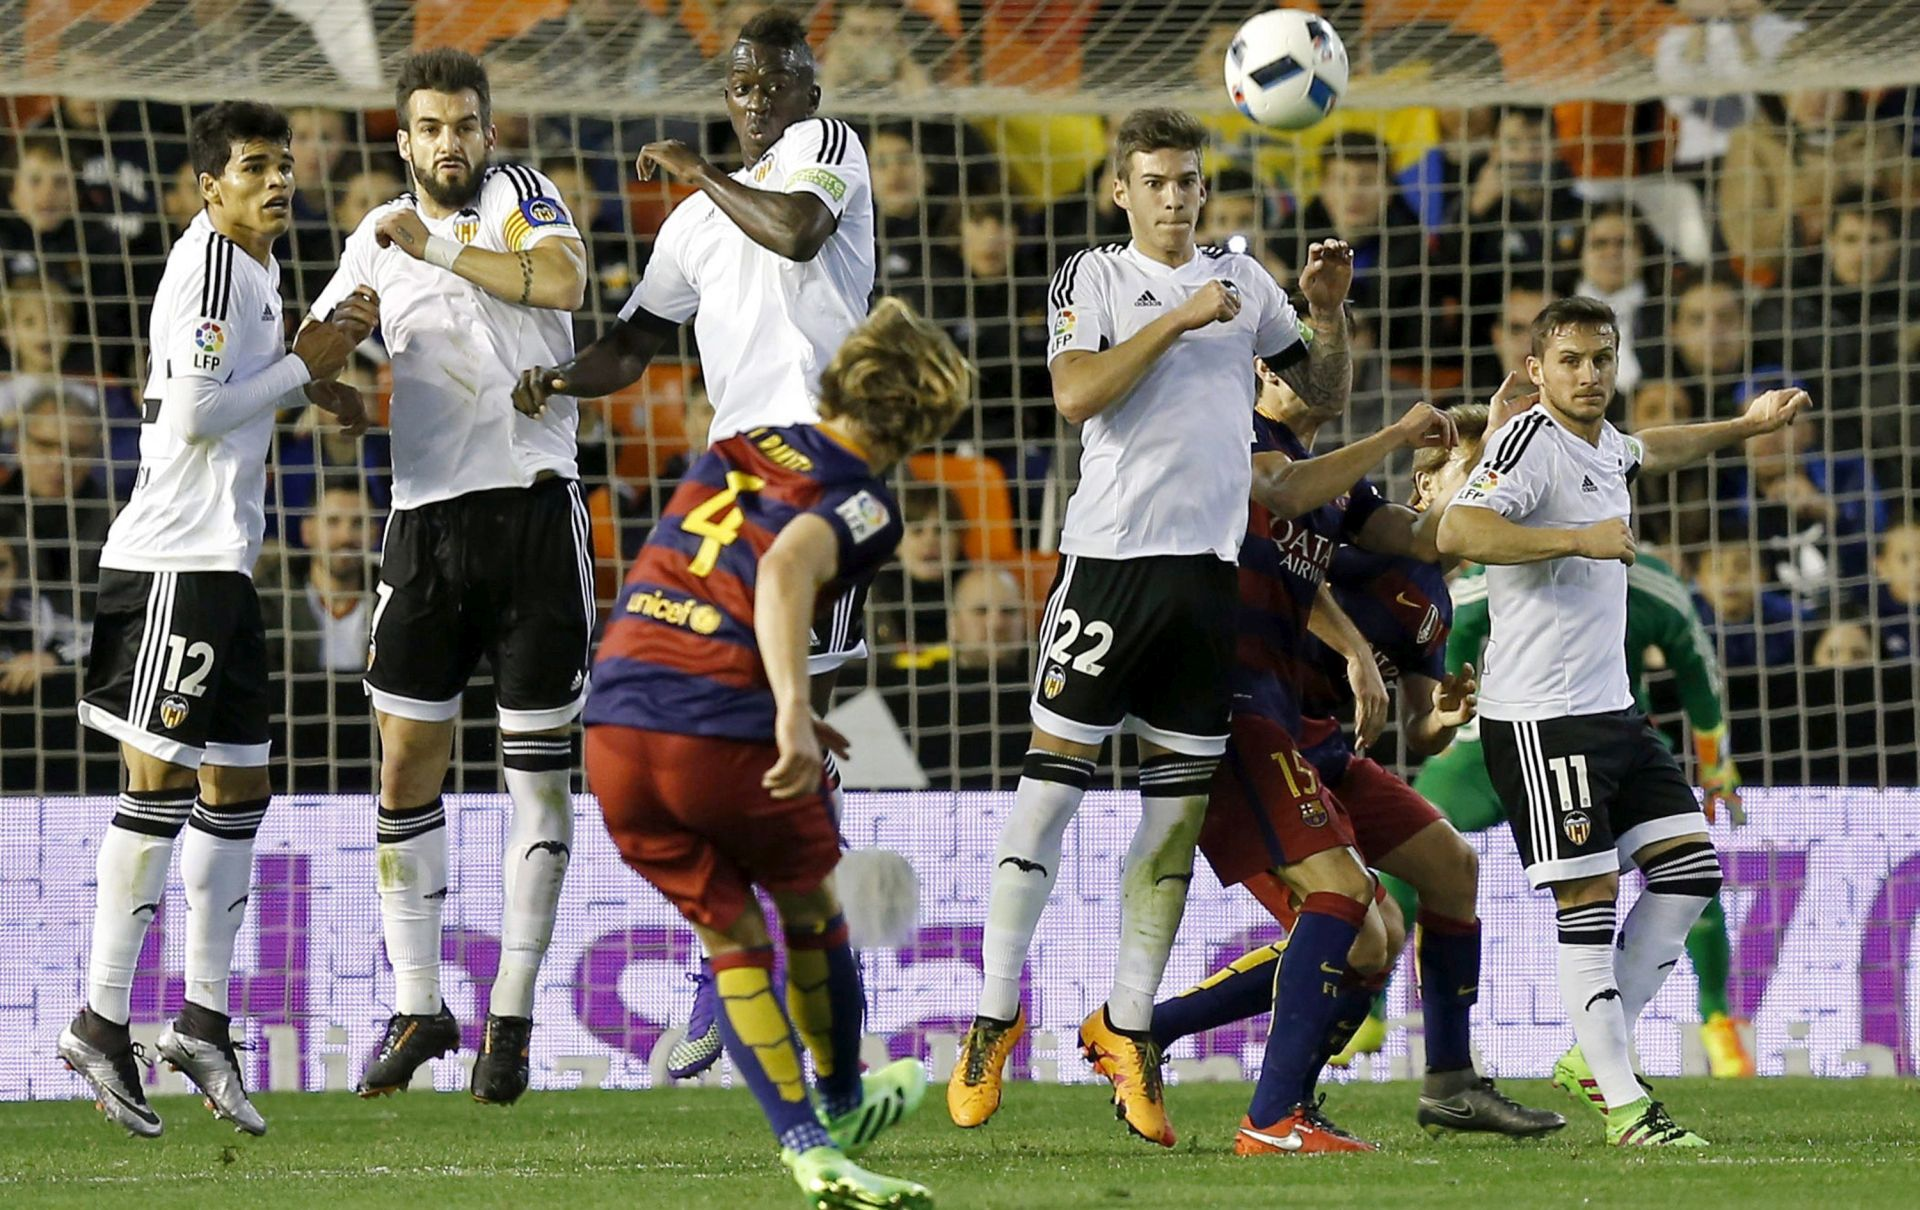 KUP KRALJA Barcelona u finalu, večeras s Valencijom odigrali 1:1